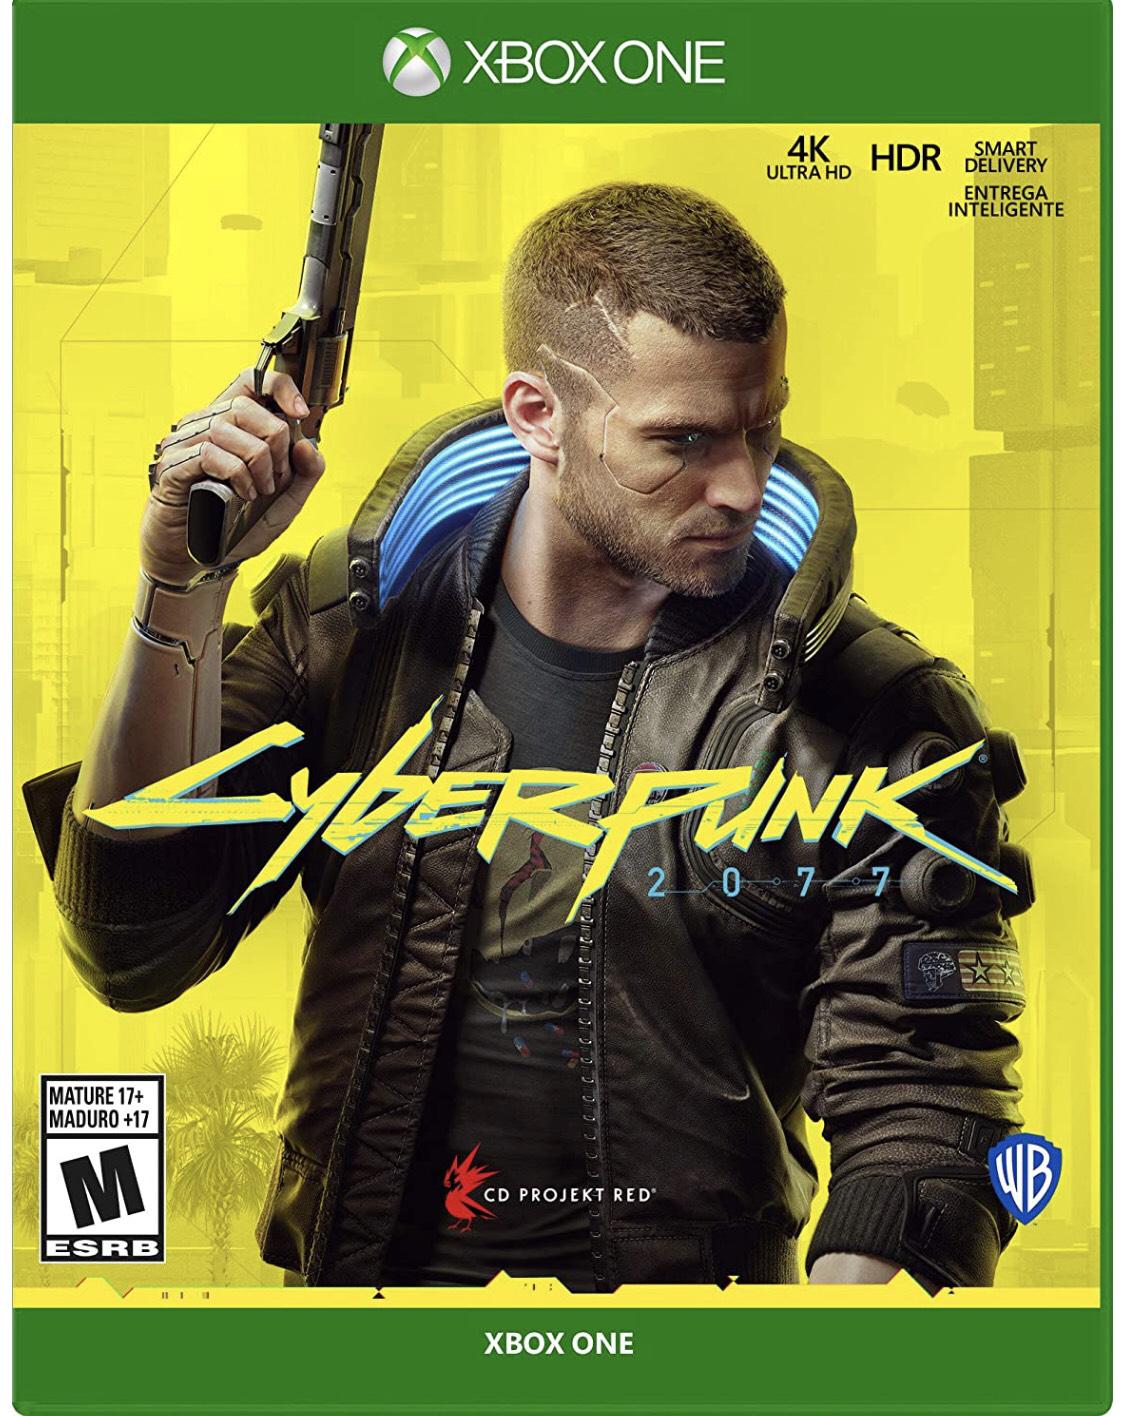 Amazon: Cyberpunk 2077 - Xbox One - Standard Edition - Standard Edition - Xbox One